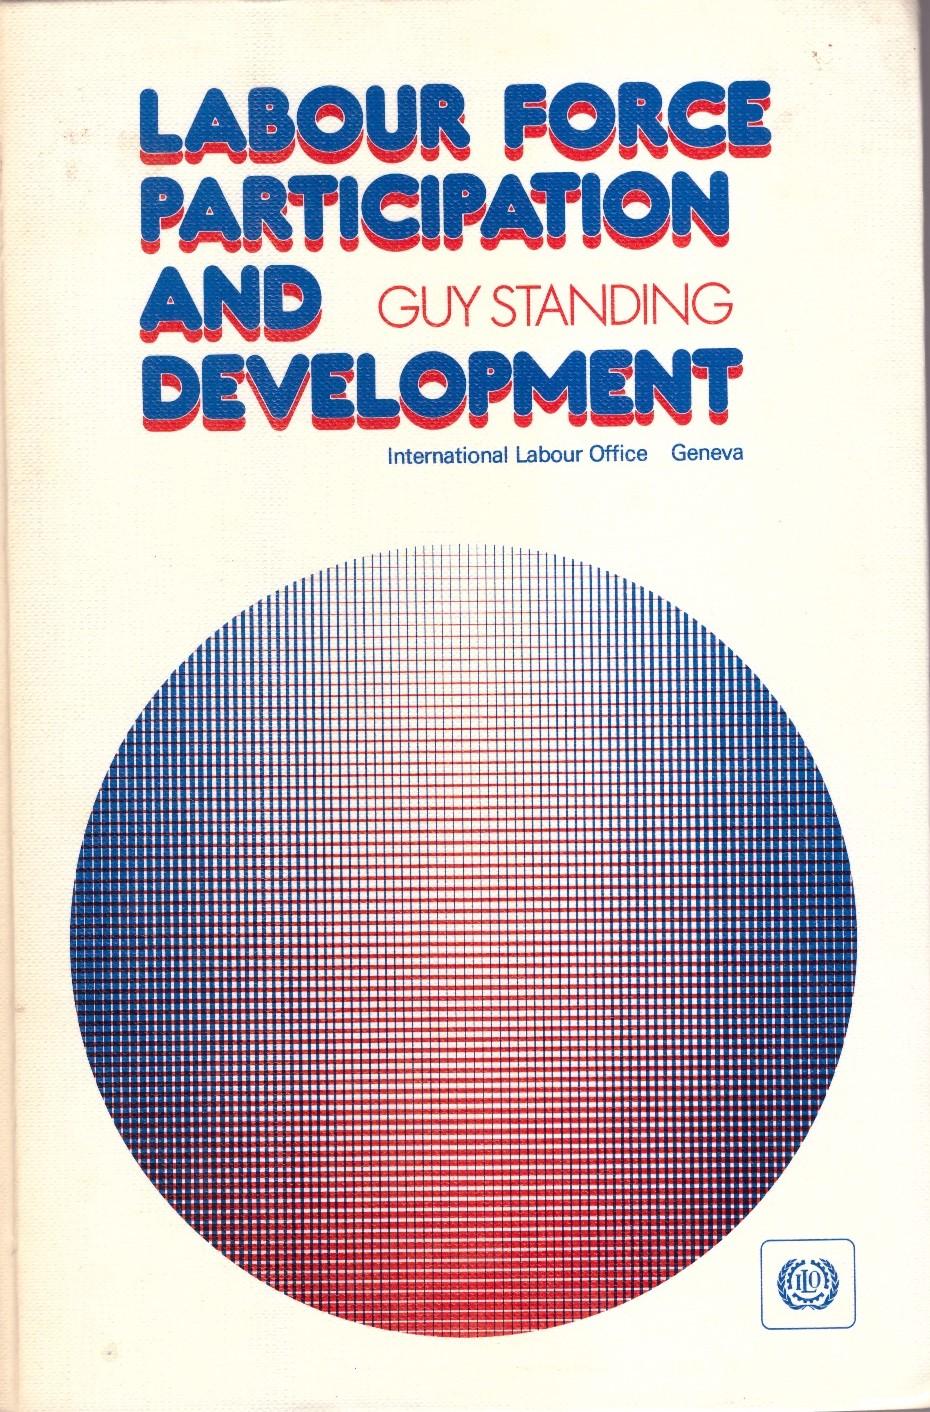 Labour Force Participation and Development  (Geneva: ILO, 1978; 2nd edn., 1981, reprinted 1982).   Details